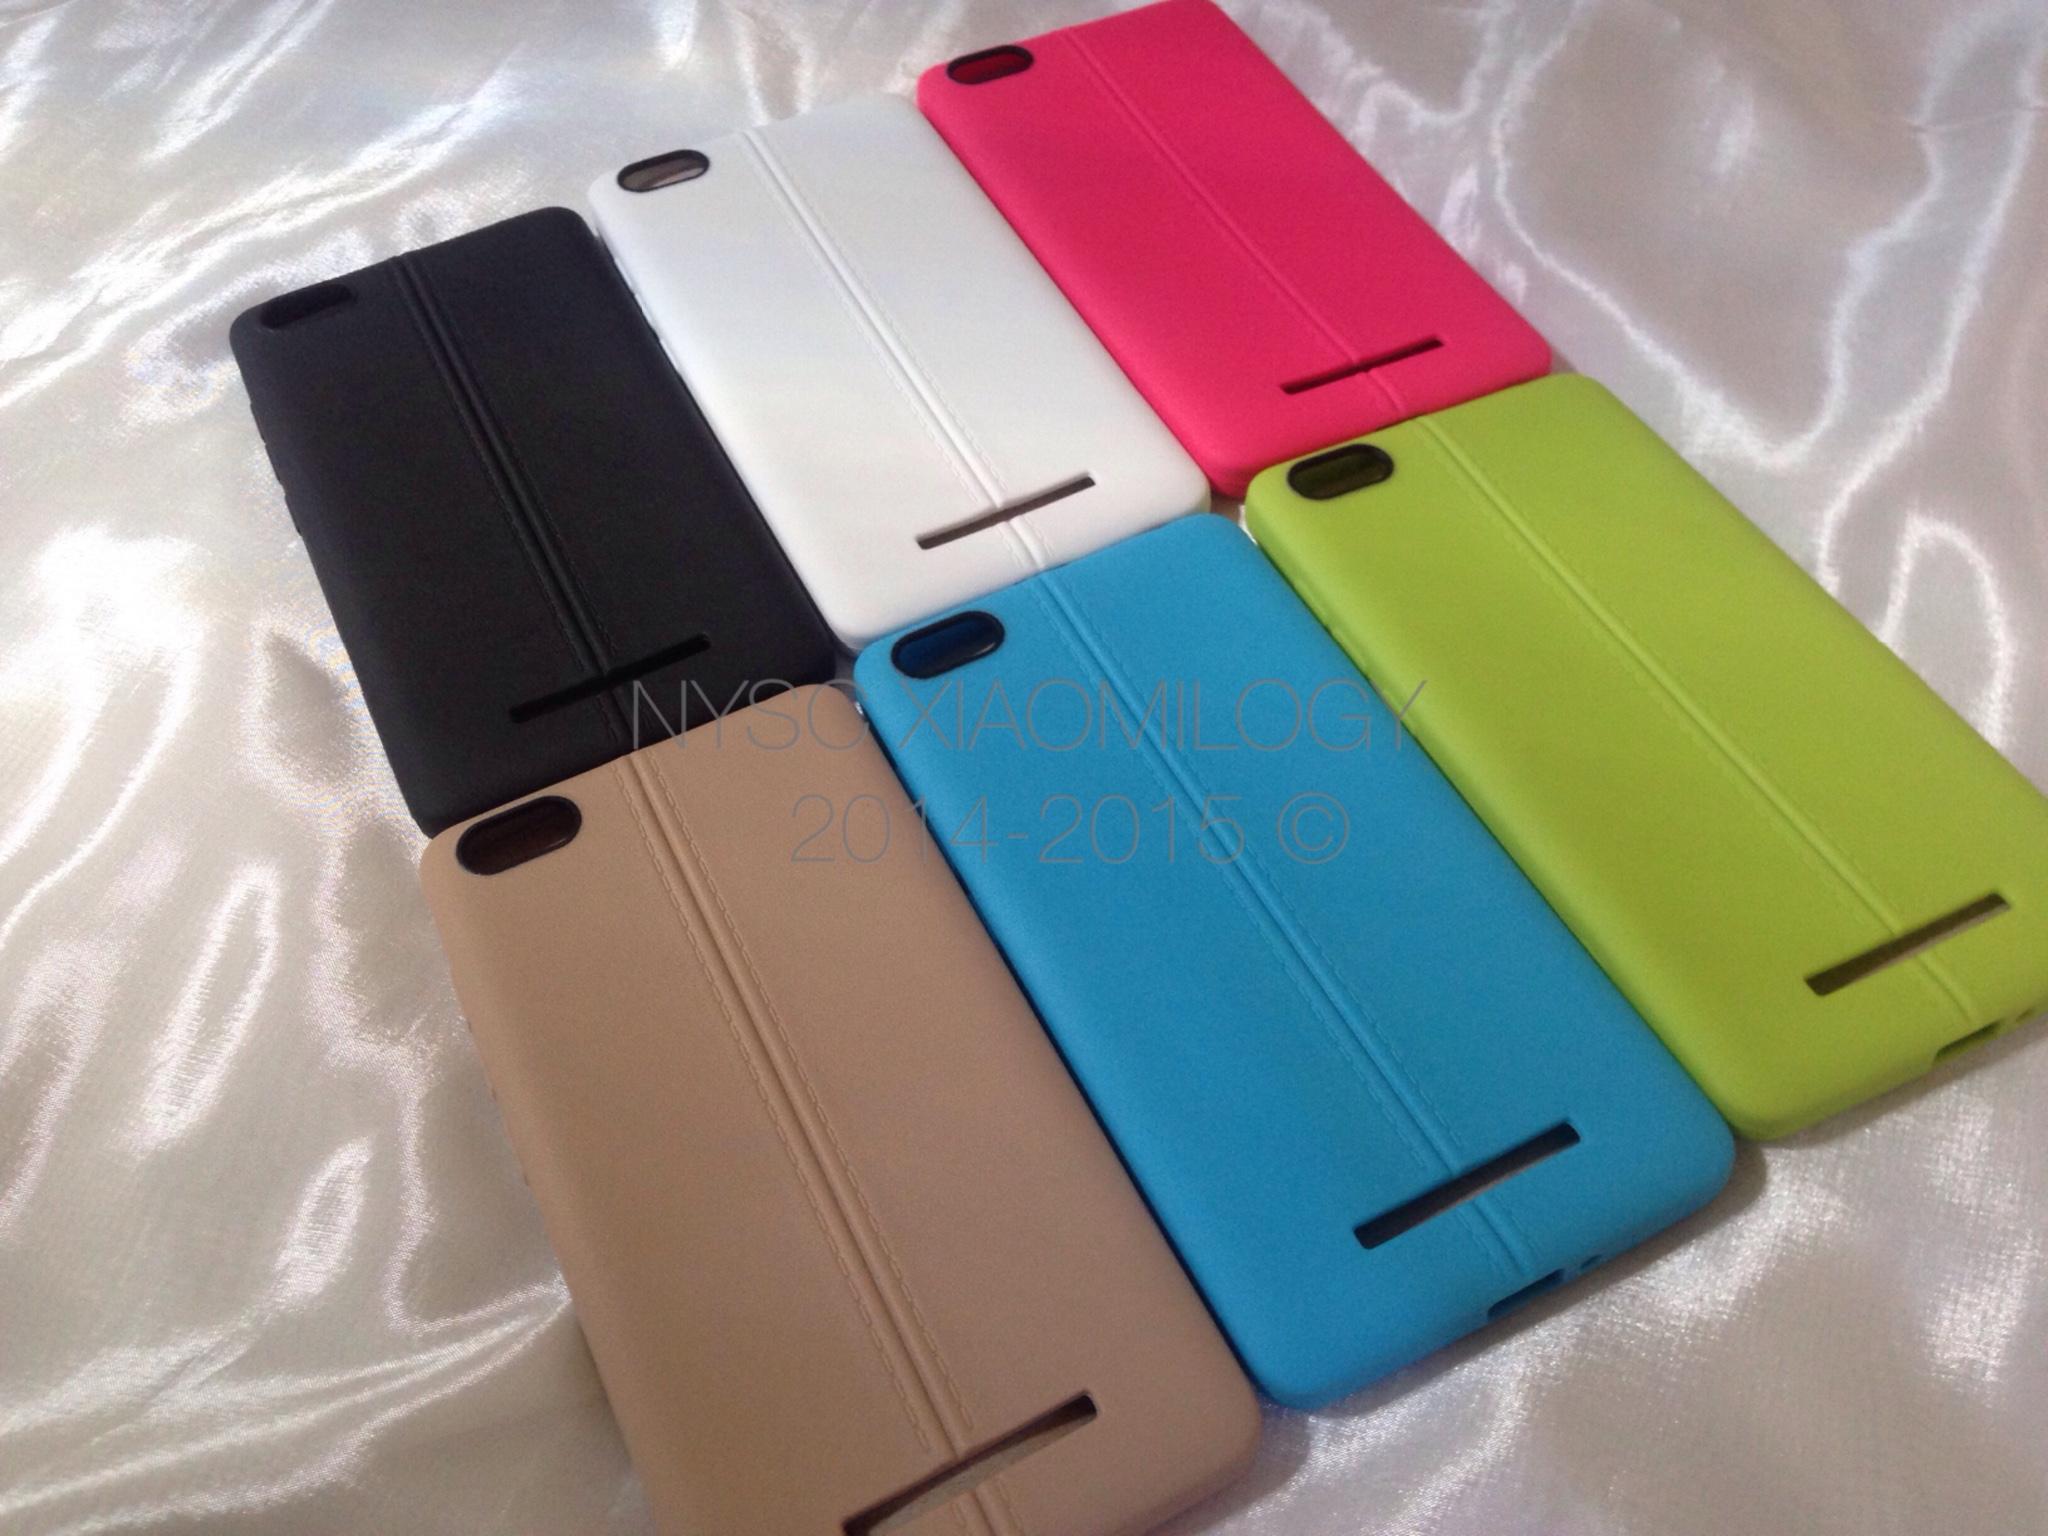 Terjual Xiaomi Mi4i Mi 4i Tempered Glass Back Cover Case Ume Motomo Hardcase Color Silicone Sgp